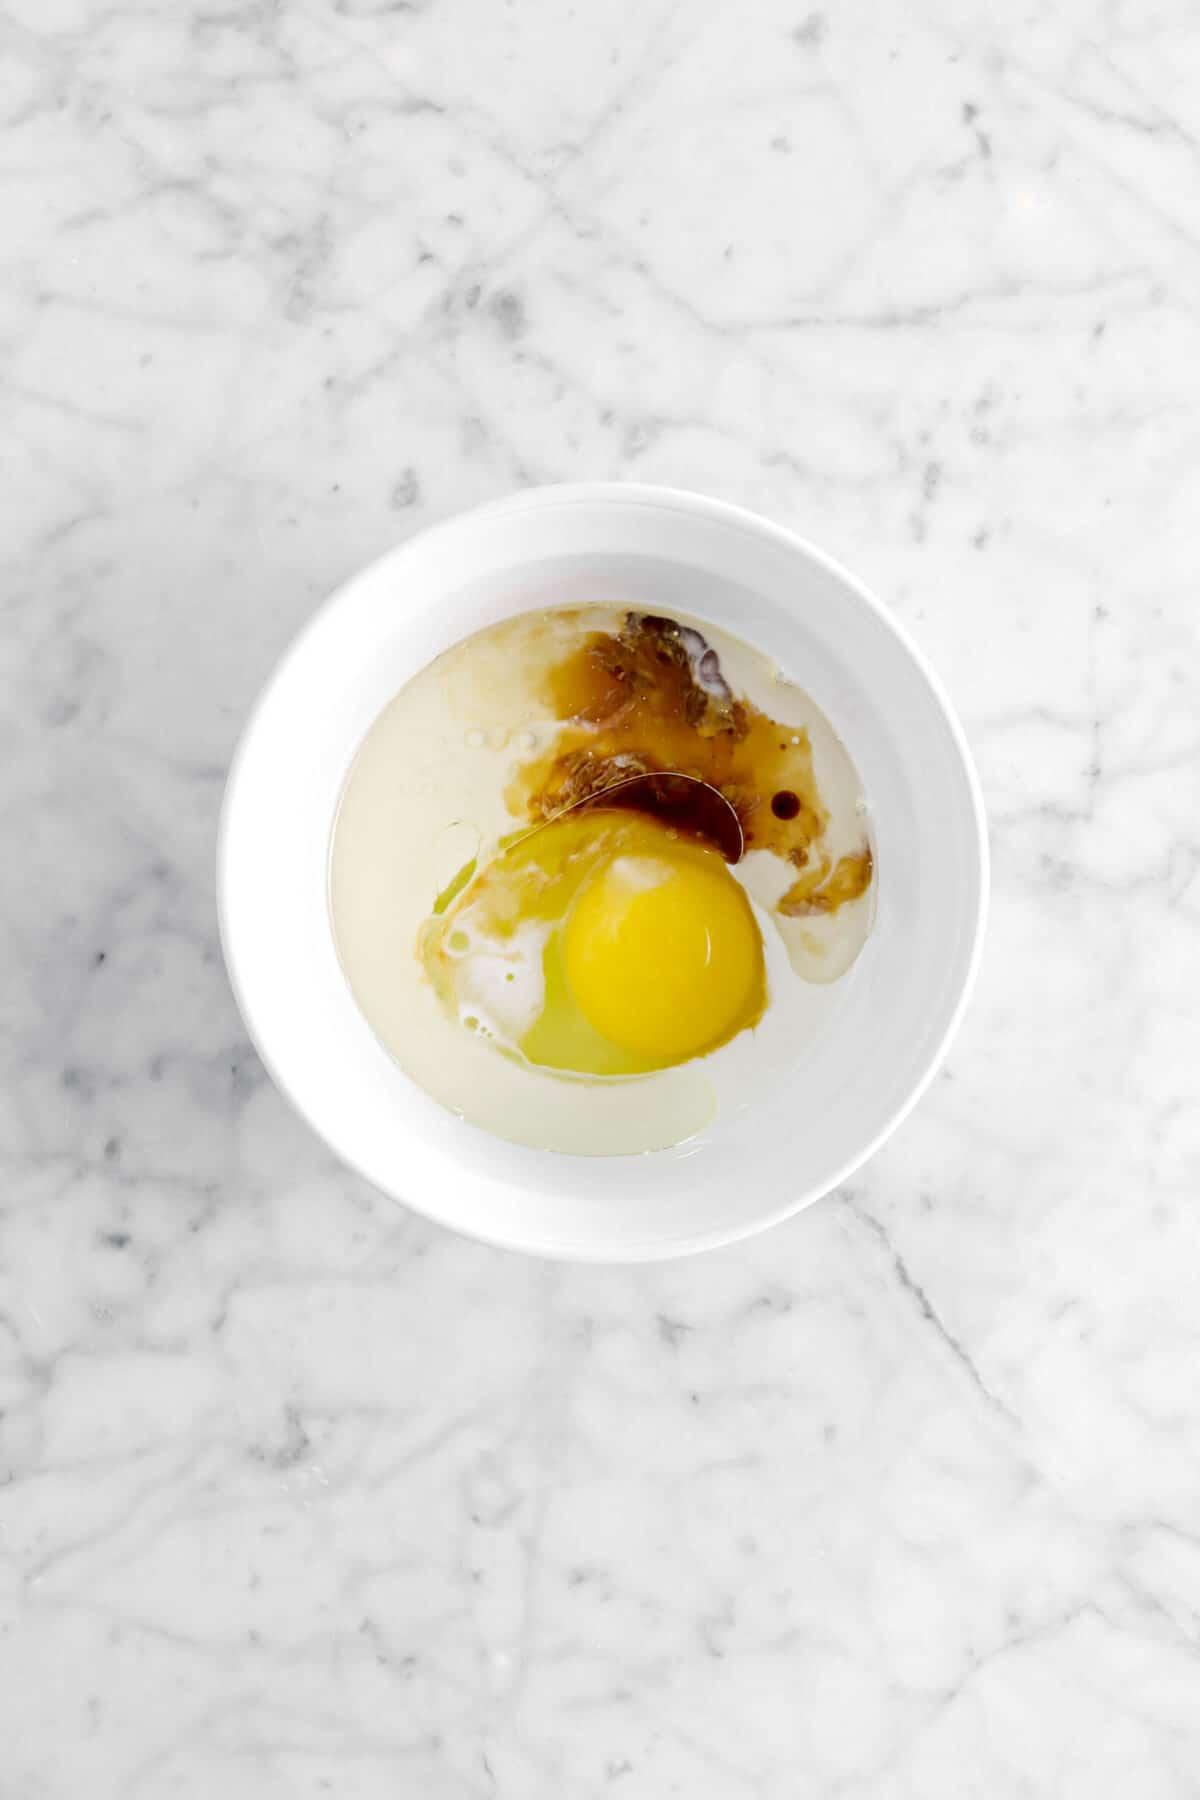 egg, oil, milk, and vanilla in white ramekin